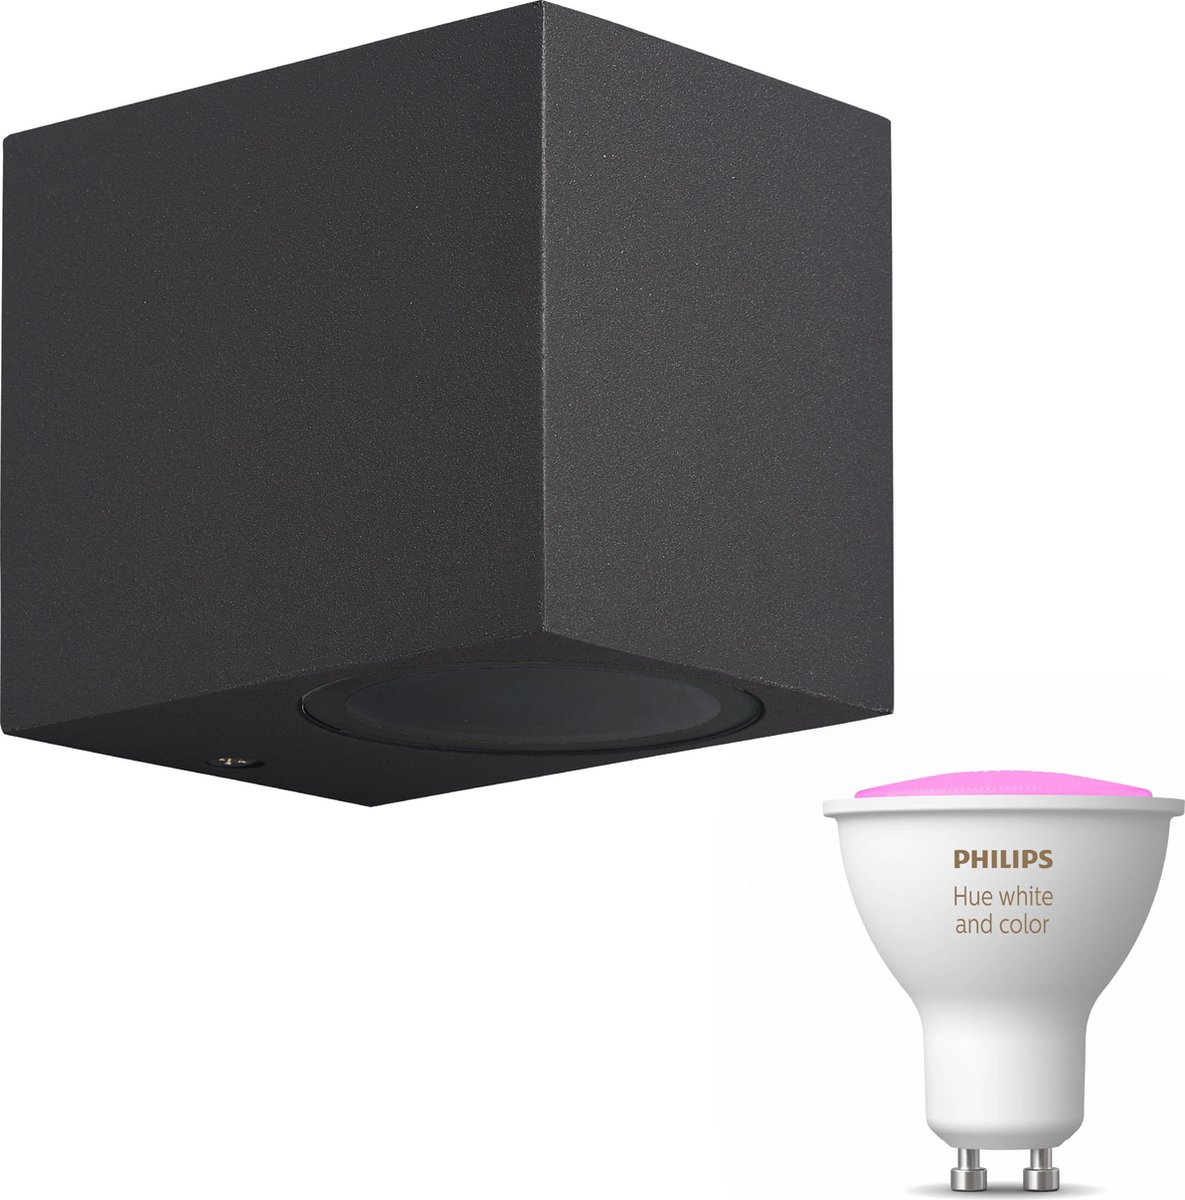 Mantra Kandachu wandlamp vierkant - antraciet - 1 lichtpunt - Incl. Philips Hue White & Color Ambiance Gu10 (geschikt voor buitengebruik)